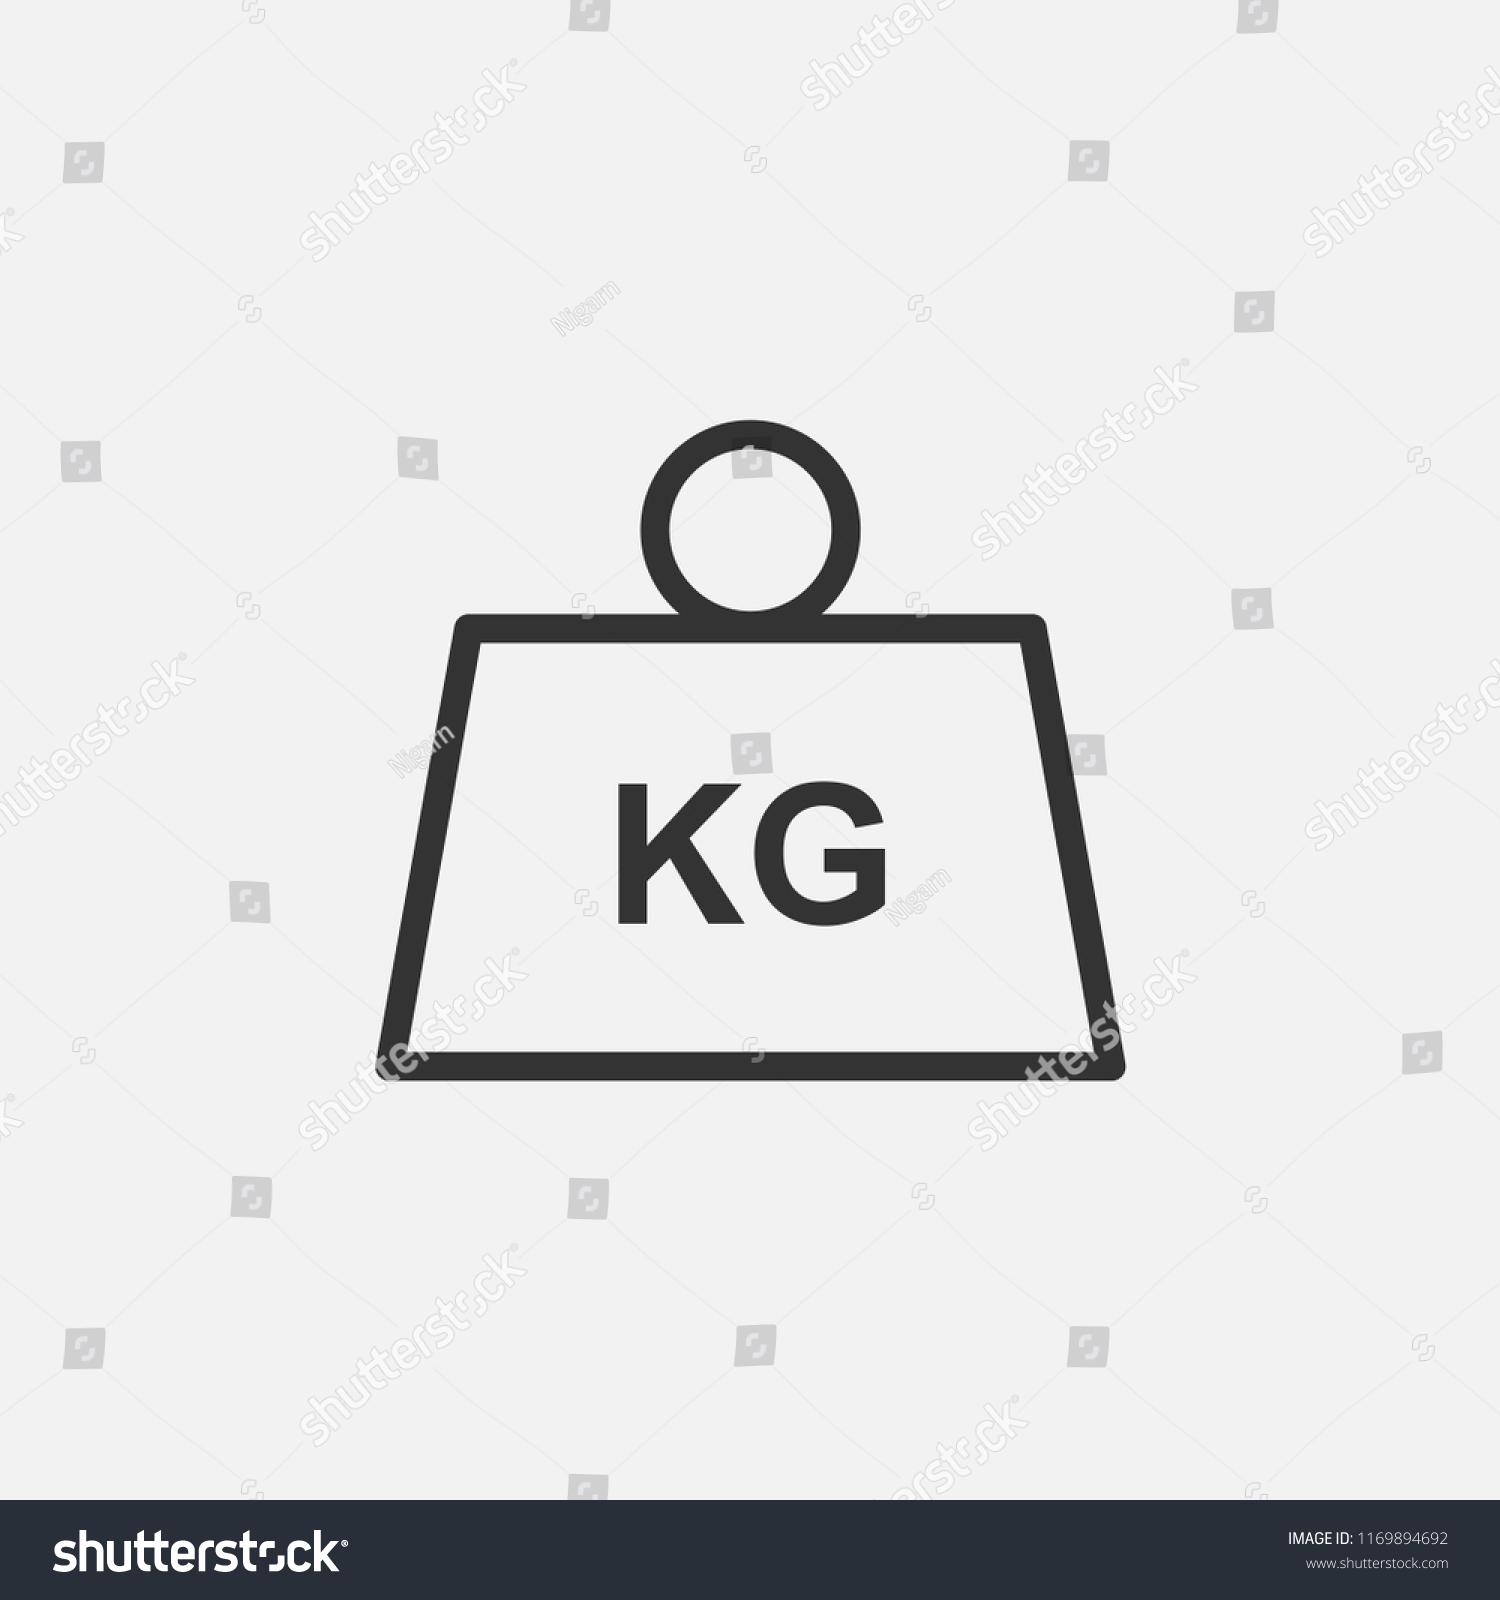 Weight Vector Iconkilogram Kg Measurement Mass Stock Vector Royalty